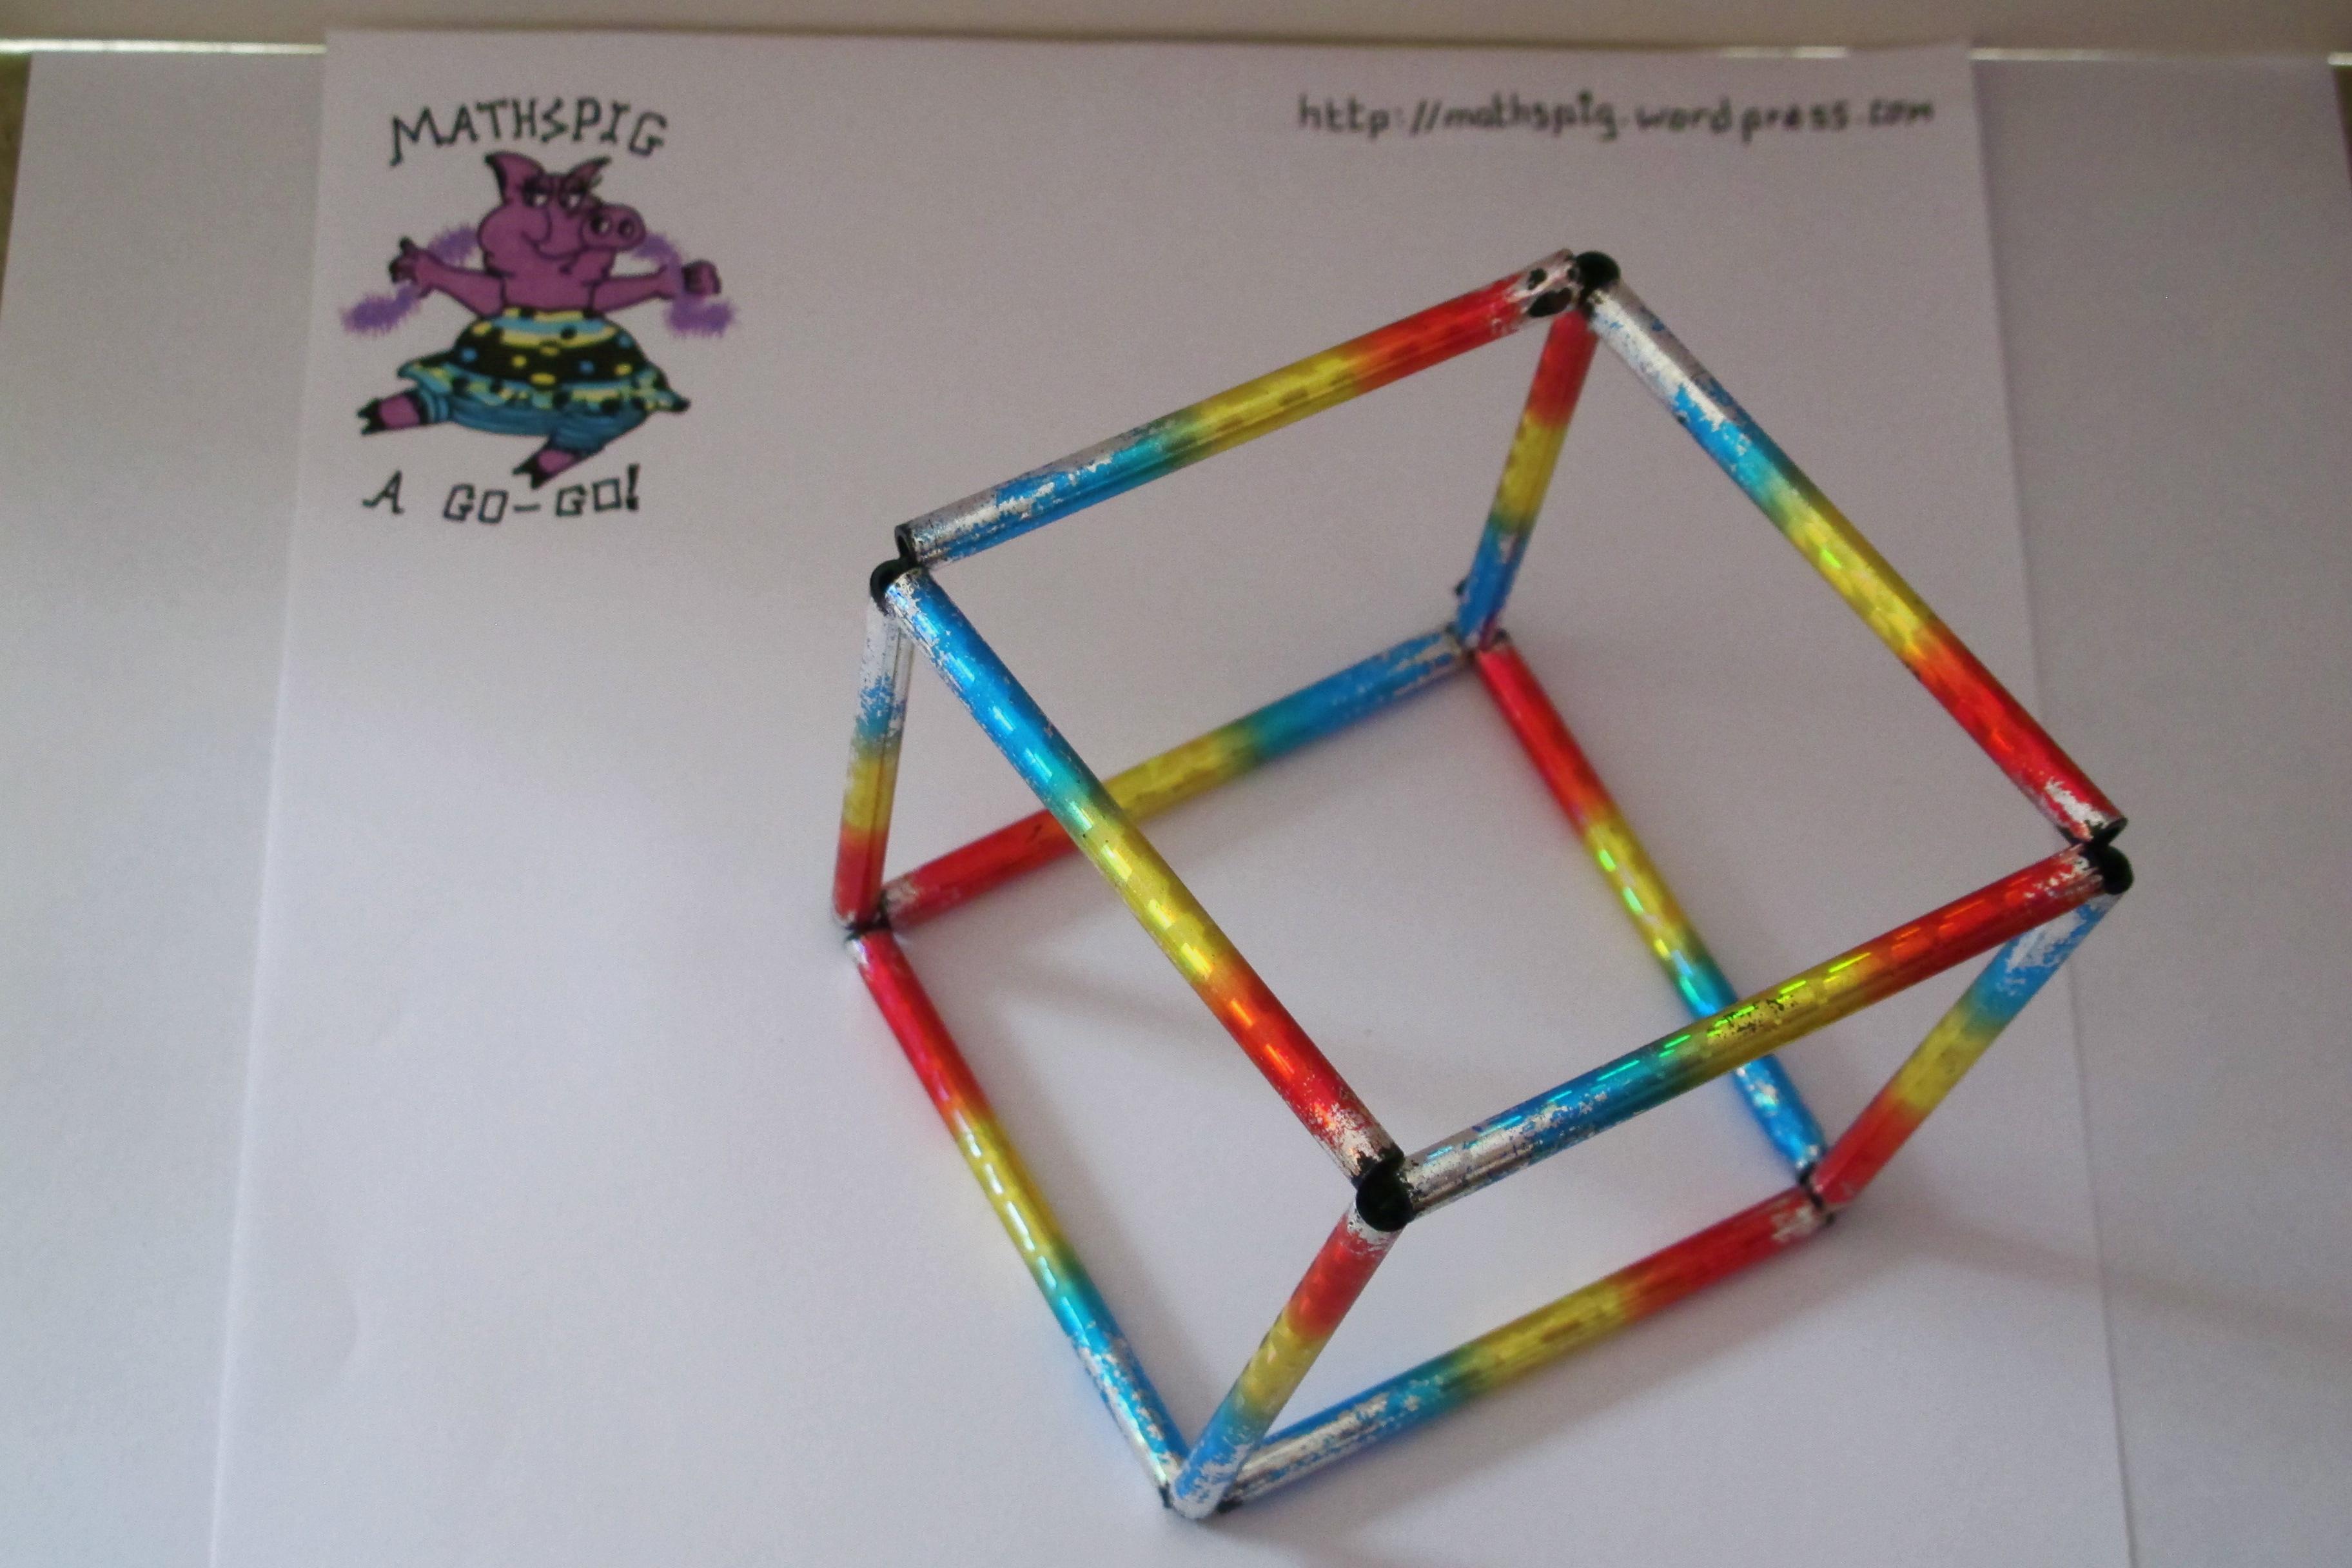 Fun maths mathspig blog - What can you make with straws ...